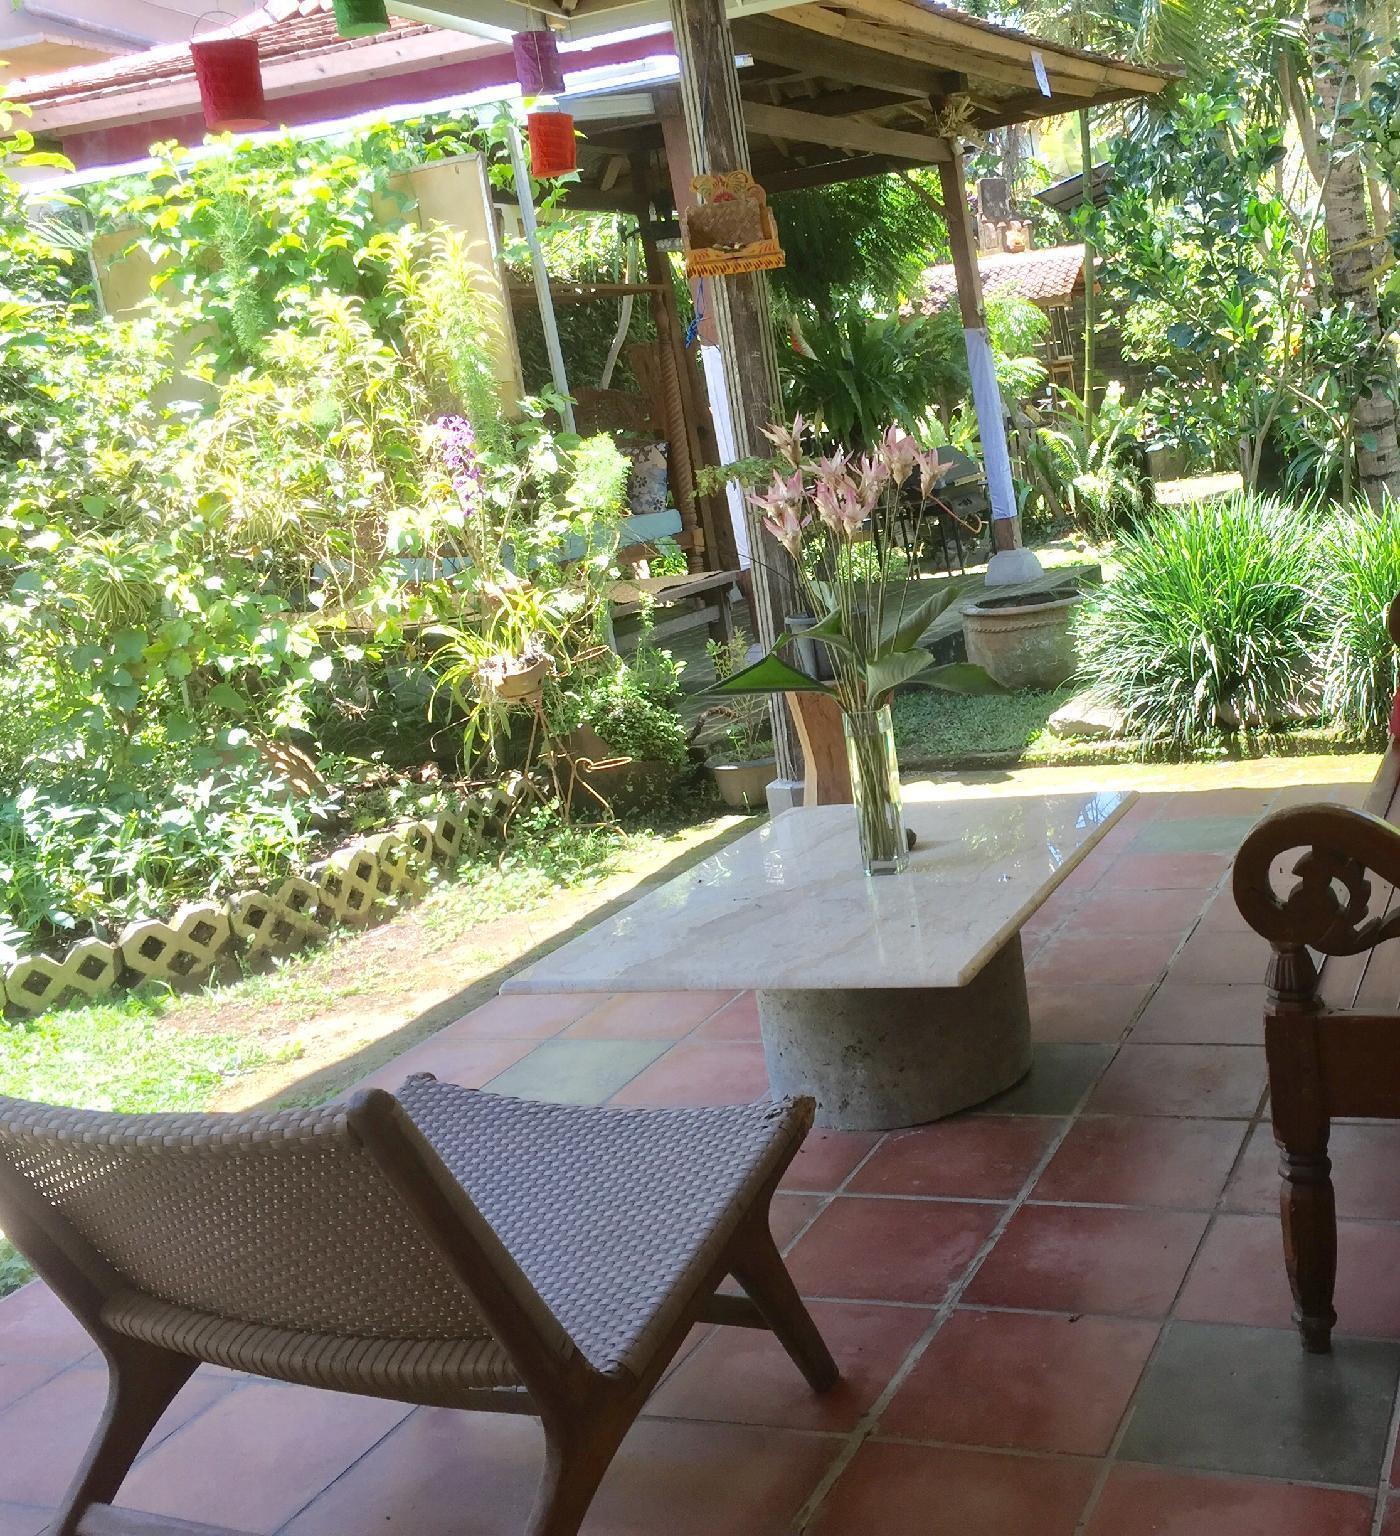 A Peacefull Bungalow near Center of Ubud